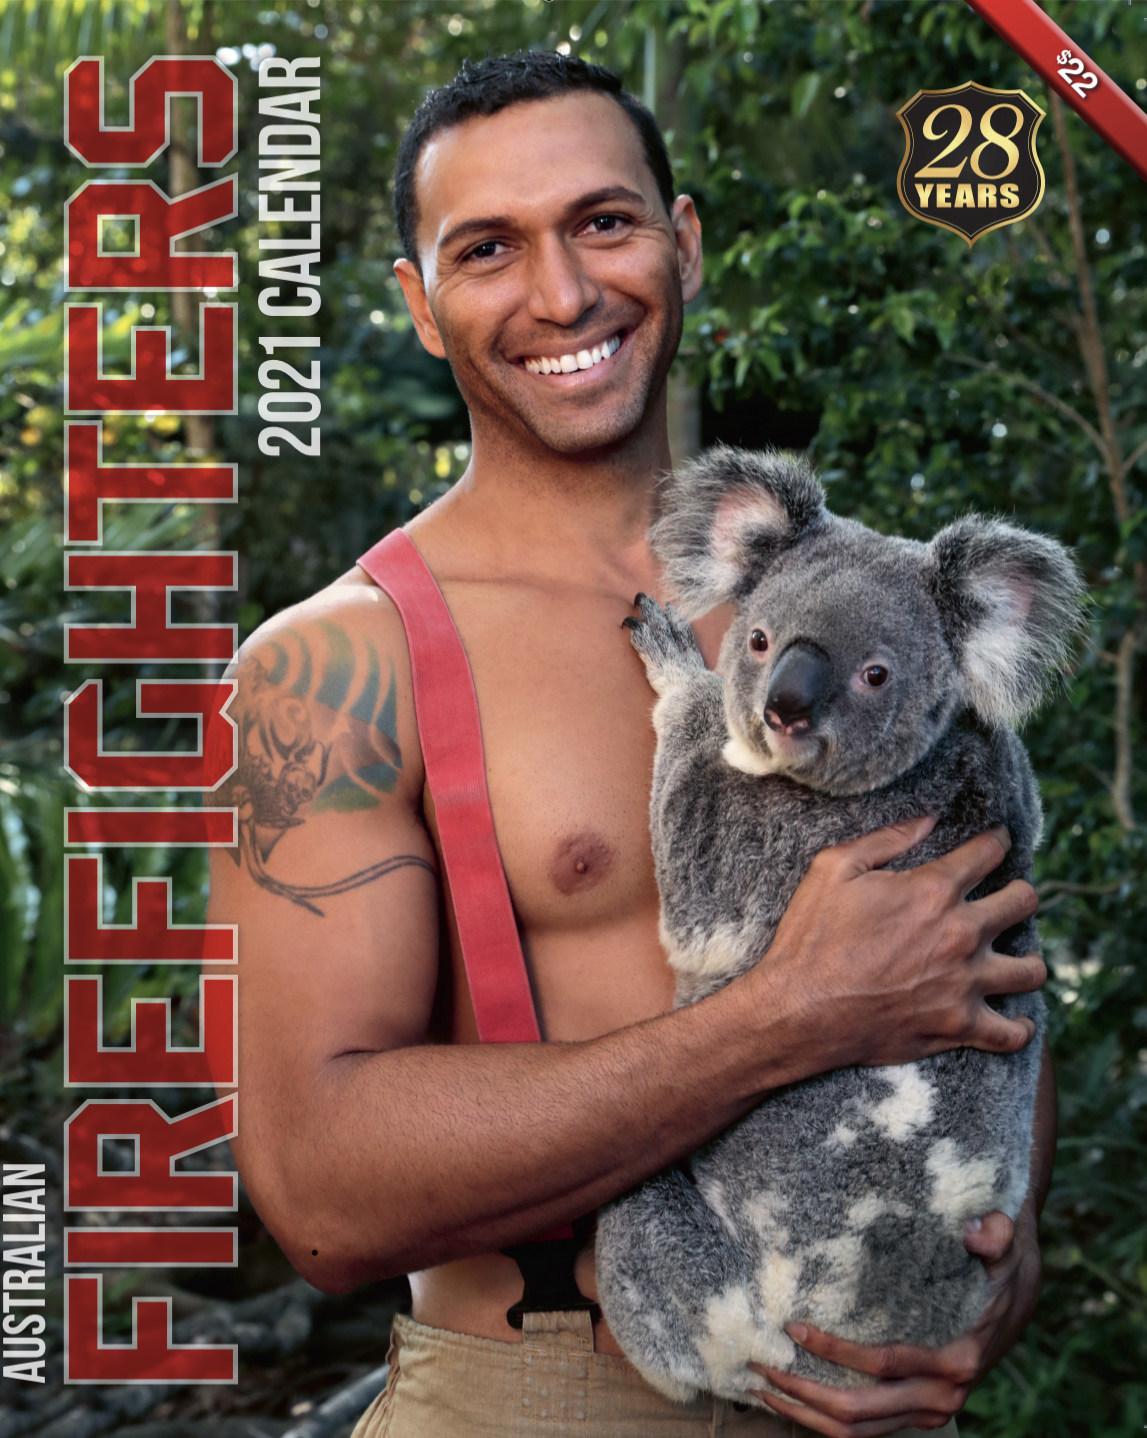 Australian Firefighters Calendar is Back for 2021